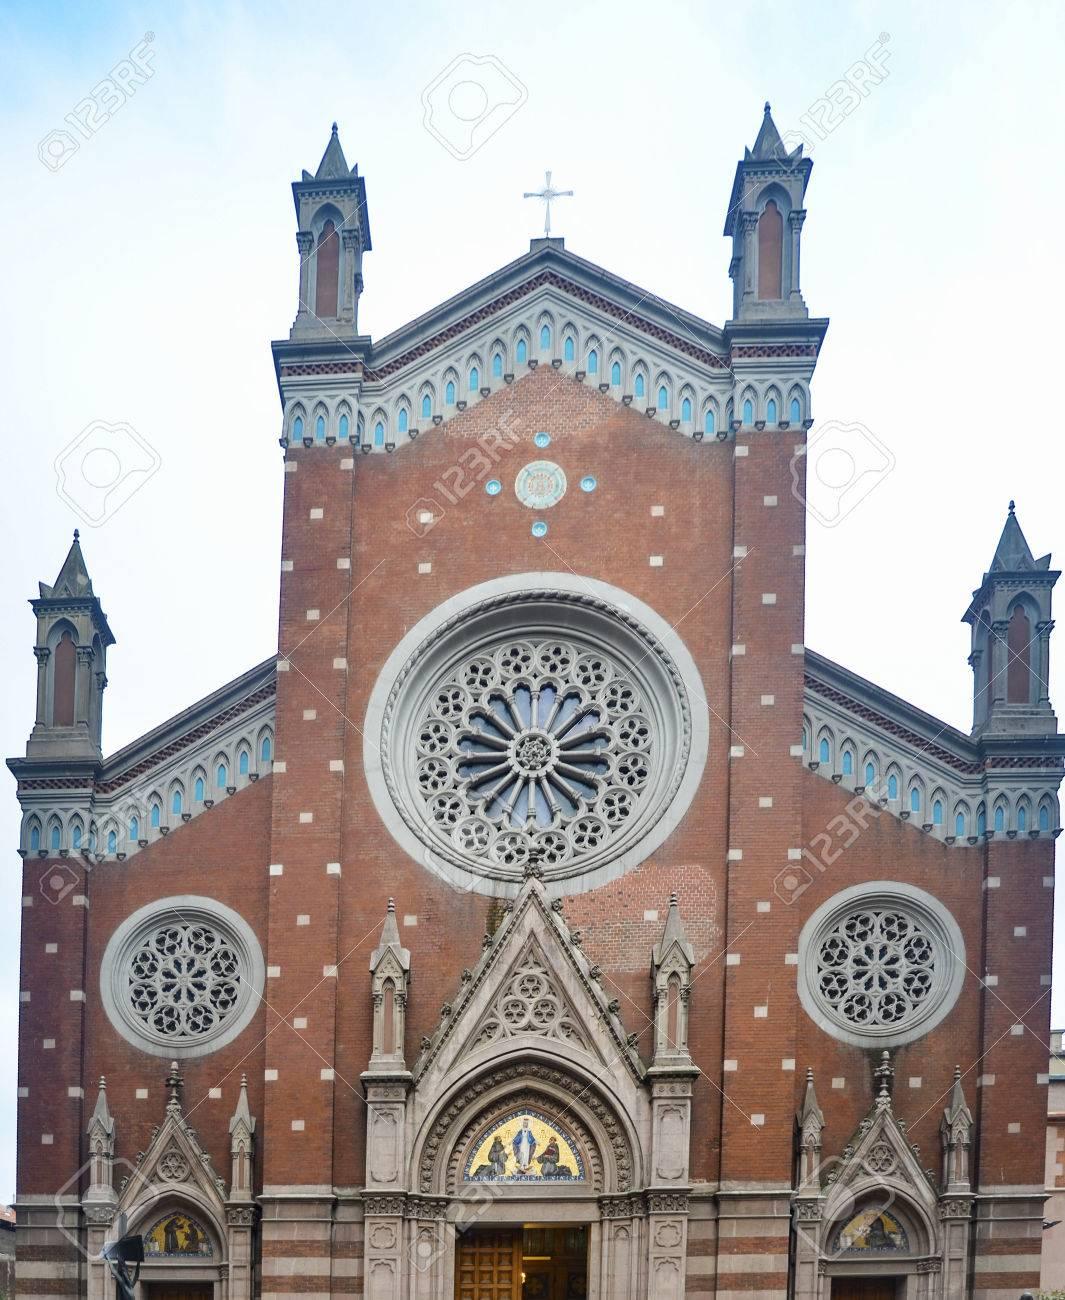 Istanbul, Turkey - December 29, 2013: St  Antoine Catholic Church